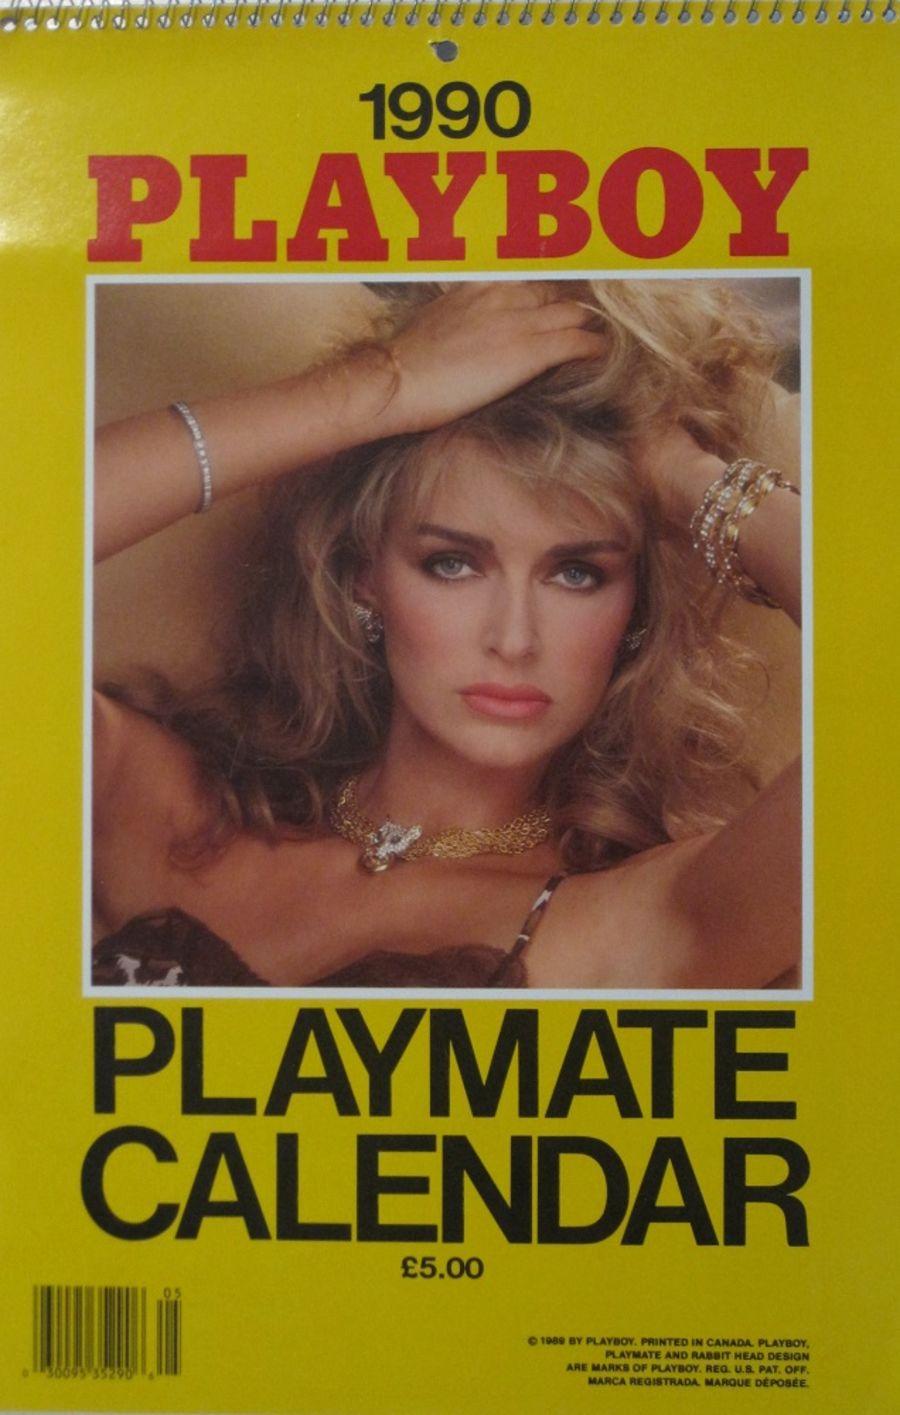 PLAYBOY PLAYMATE CALENDAR. 1990.